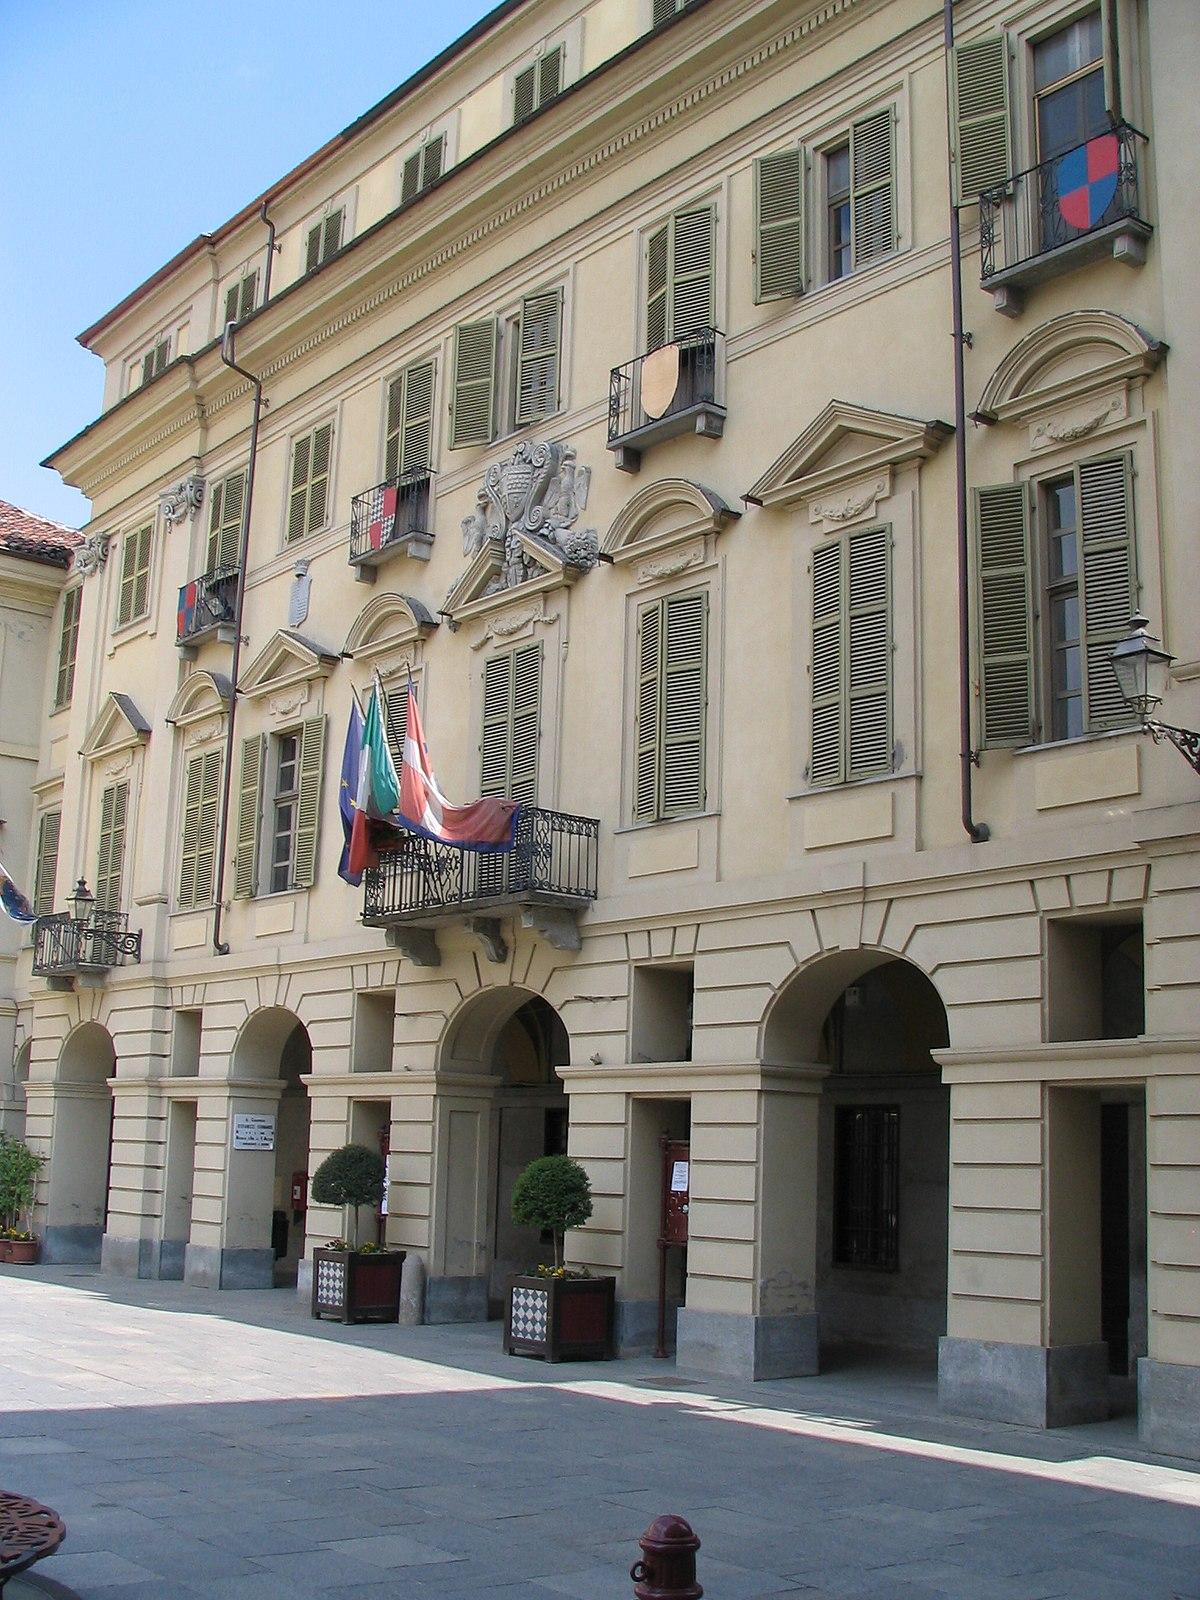 San damiano d 39 asti wikipedia - I giardini di palazzo rucellai ...